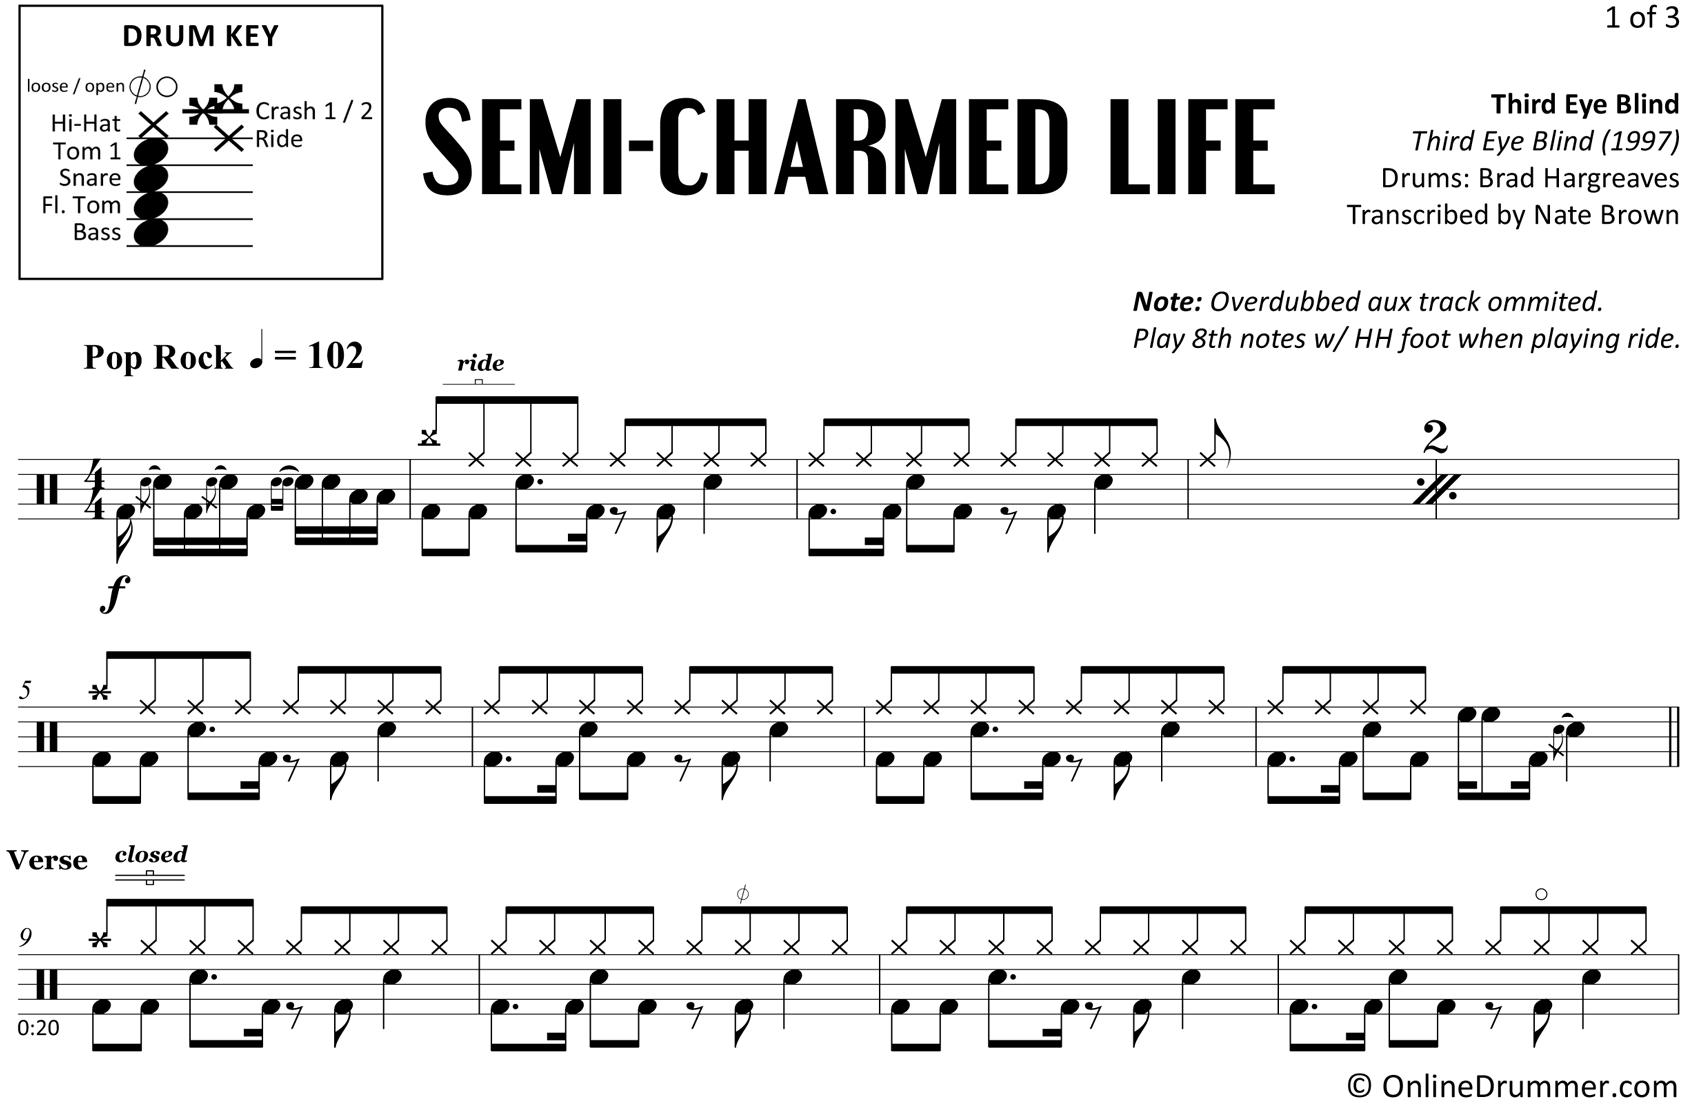 Semi-Charmed Life - Third Eye Blind - Drum Sheet Music